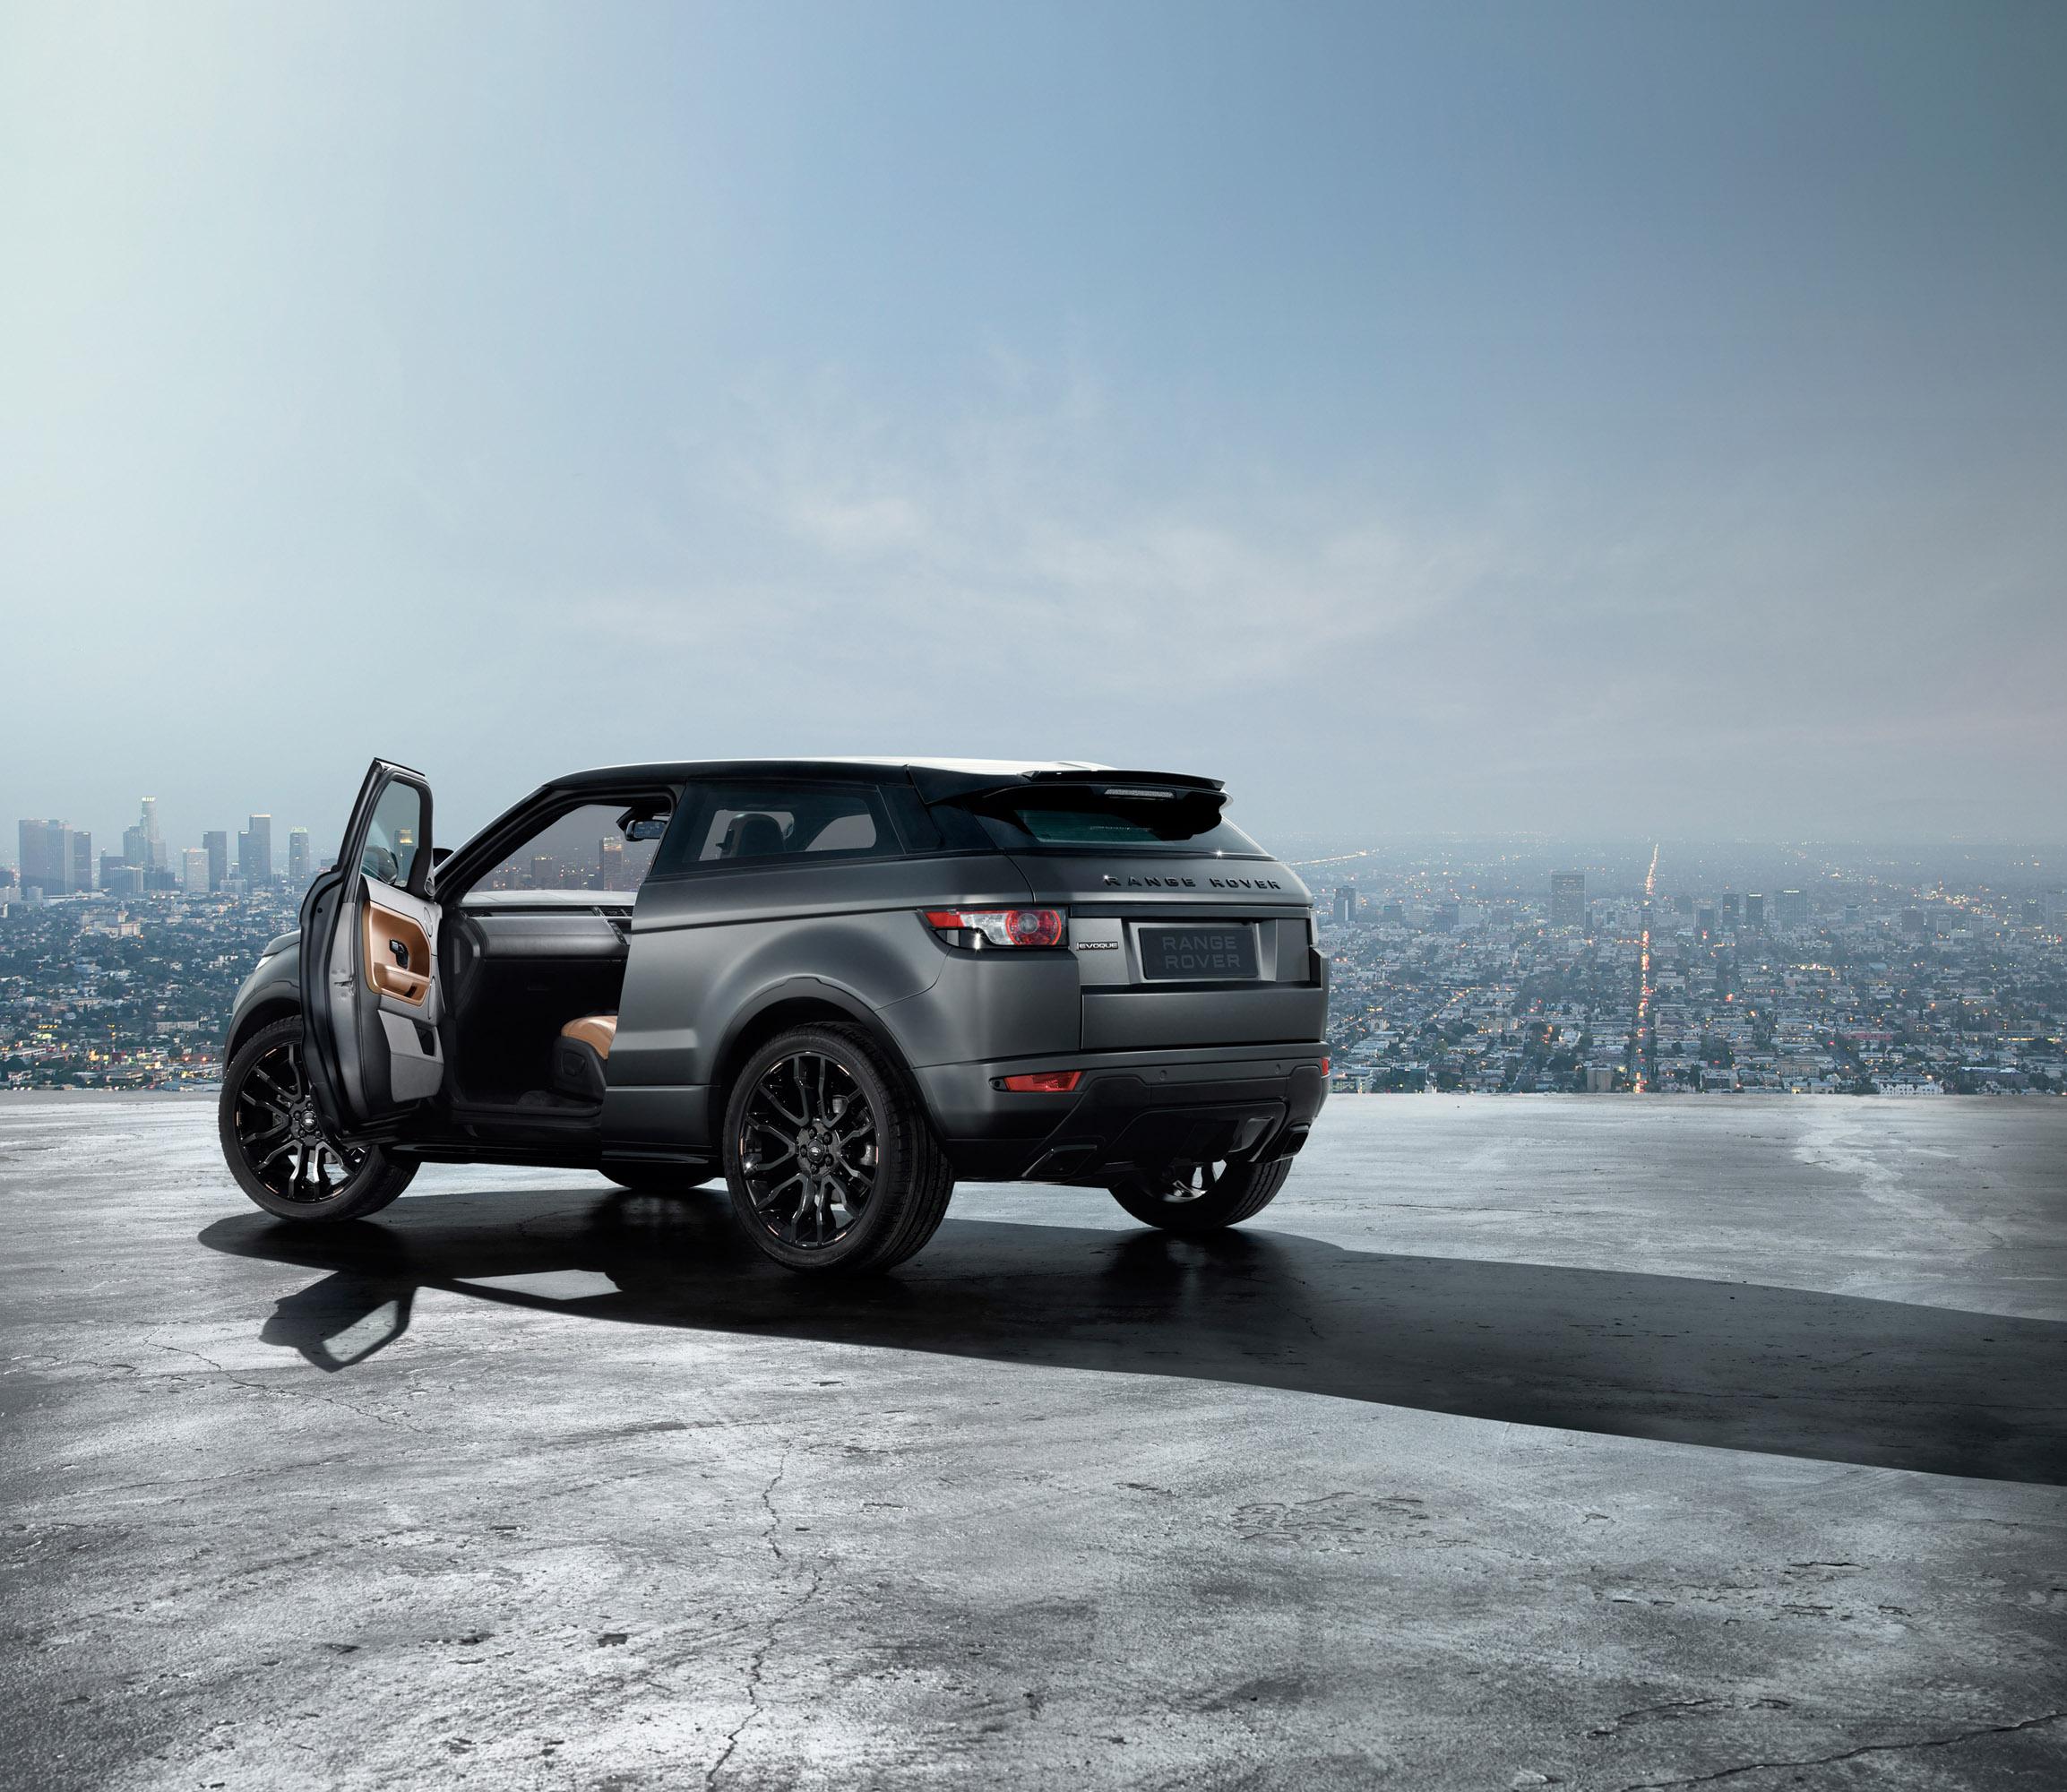 Land Rover Range Rover Evoque: 2012 Range Rover Evoque Victoria Beckham Edition